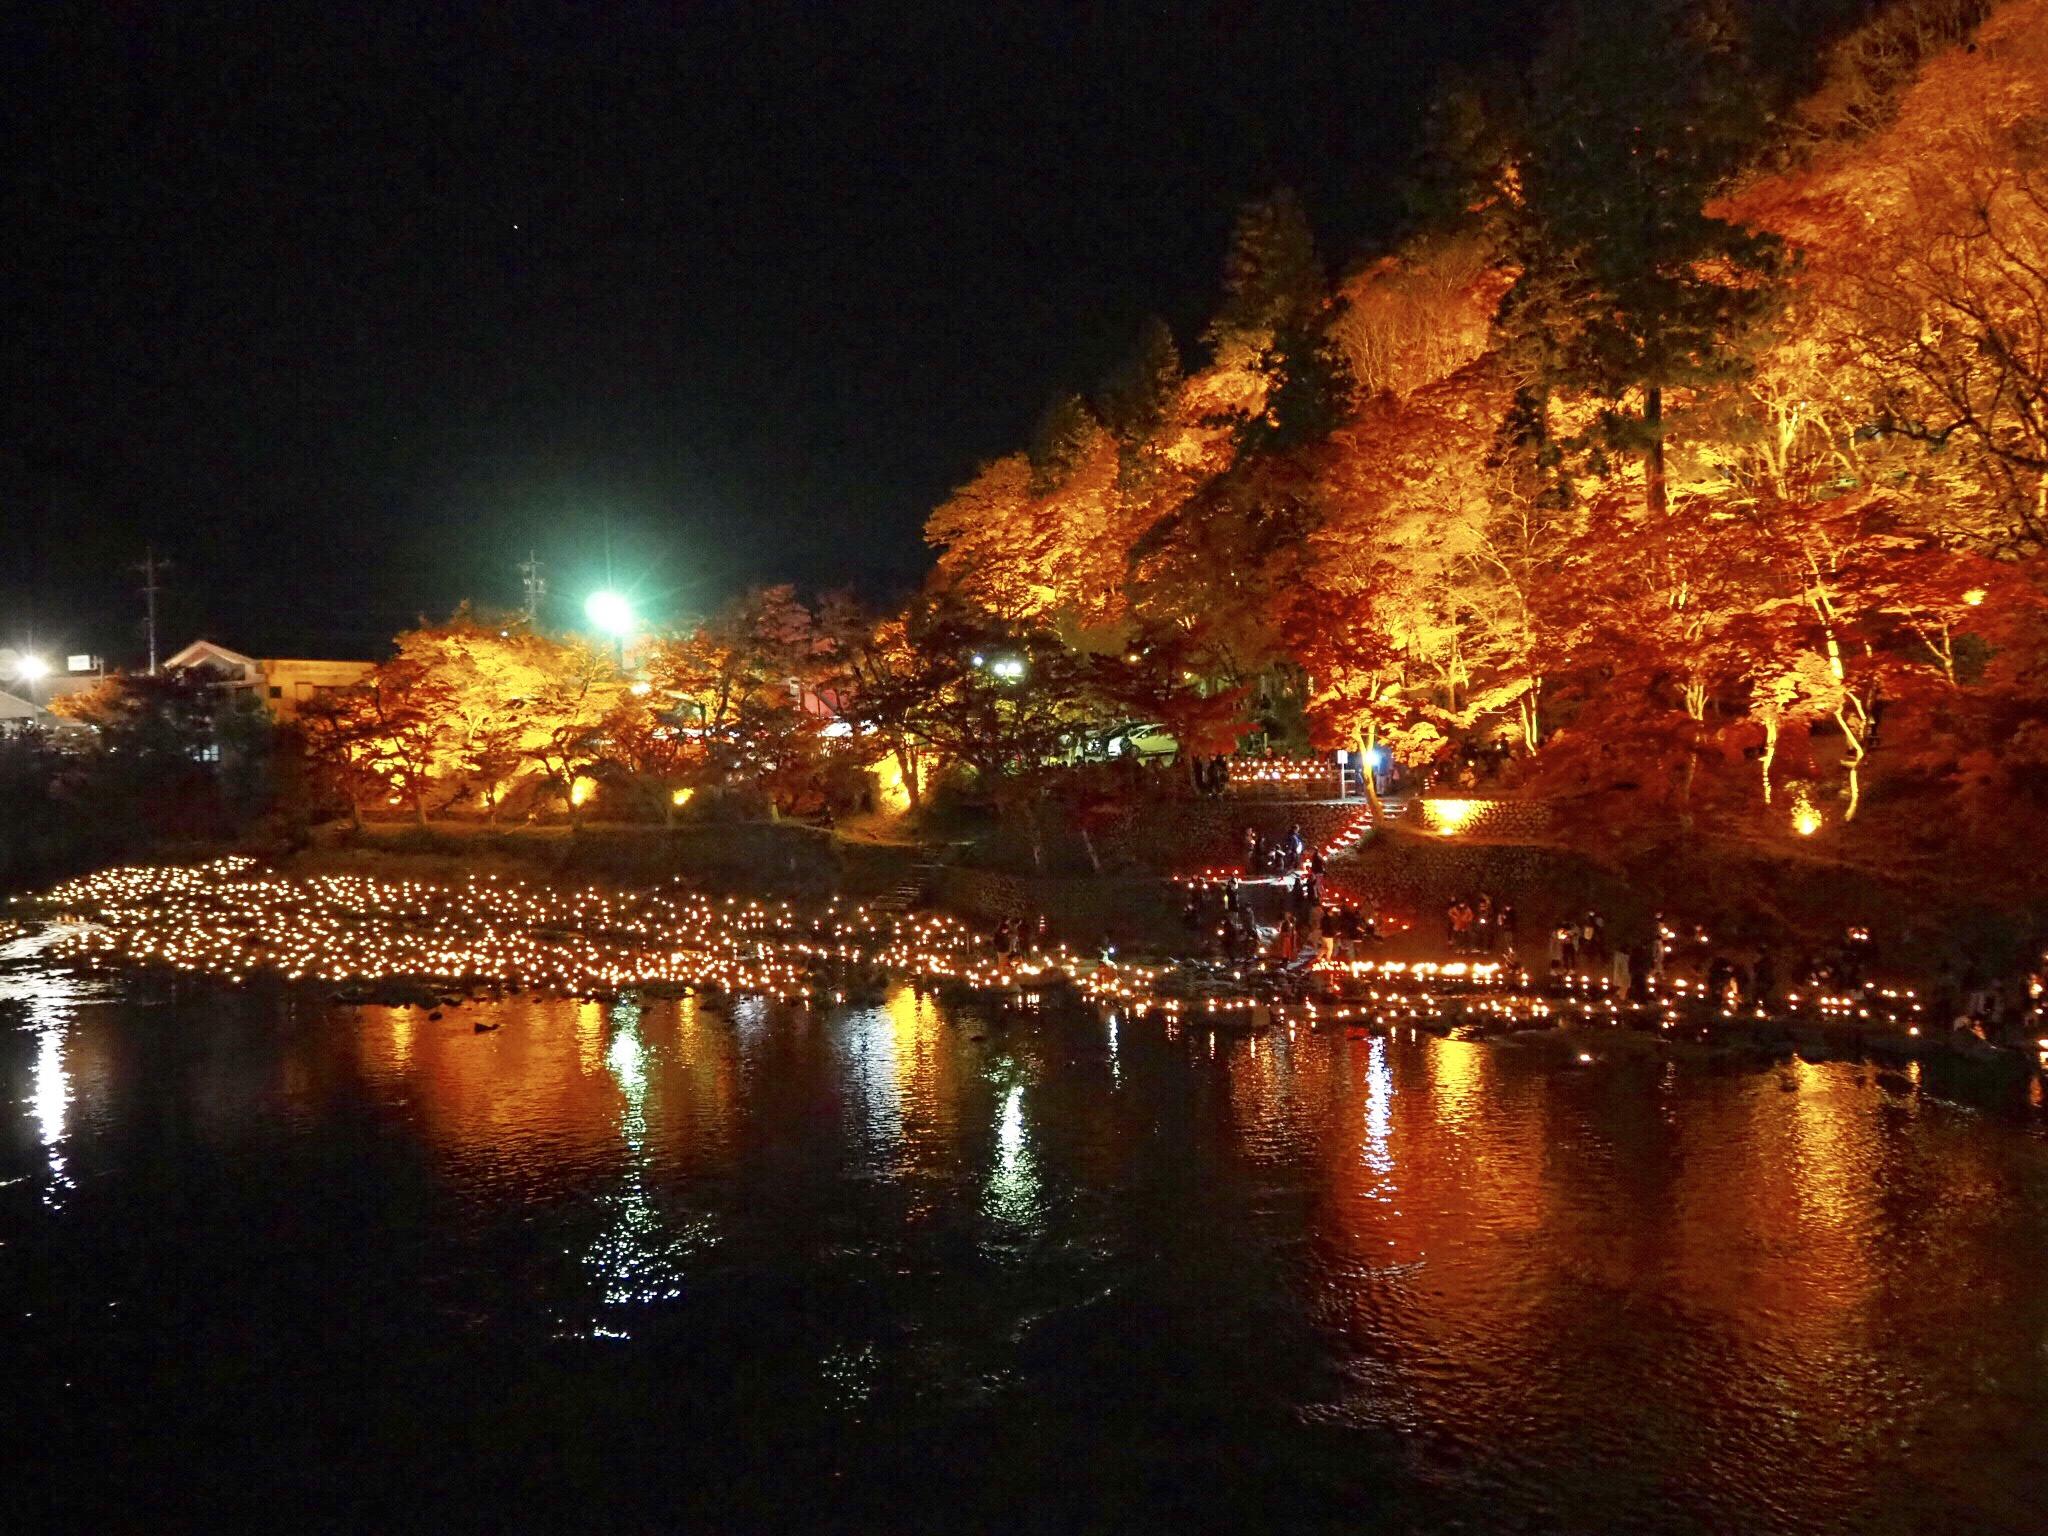 img 7575 - 香嵐渓 - 日本の秋を感じる 愛知県豊田市の紅葉スポット